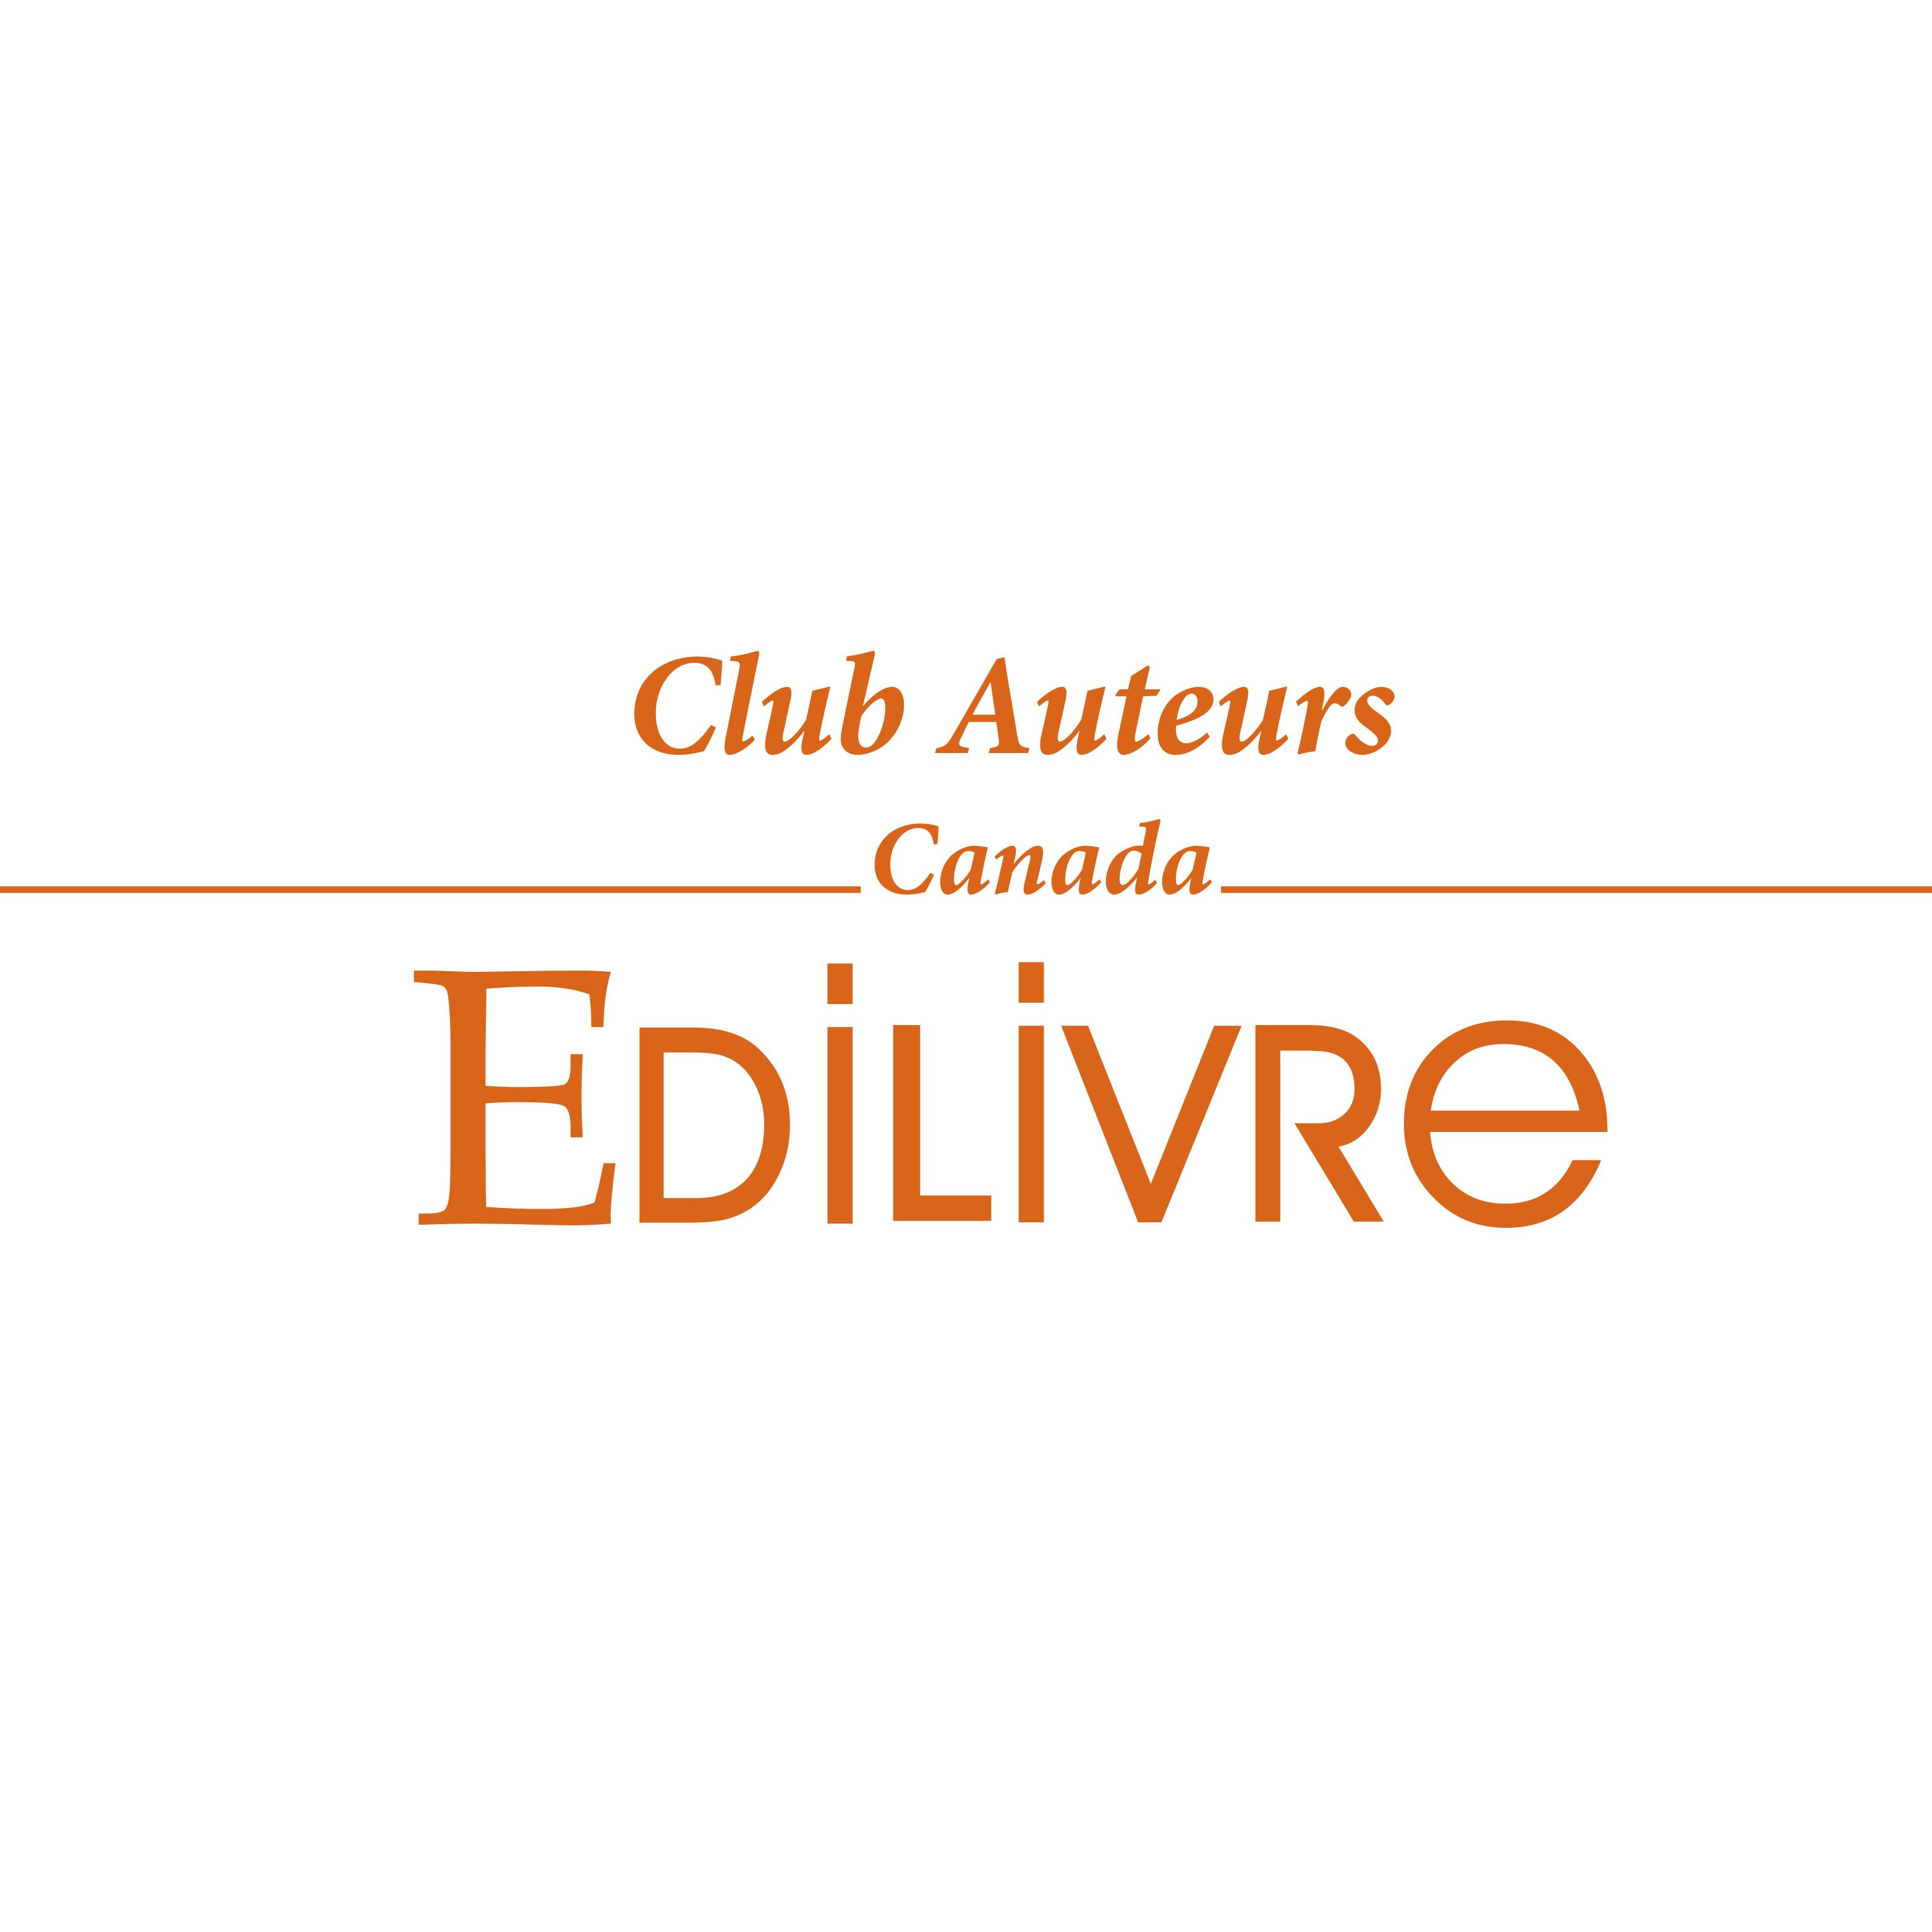 Club_Auteurs_Canada_Edilivre